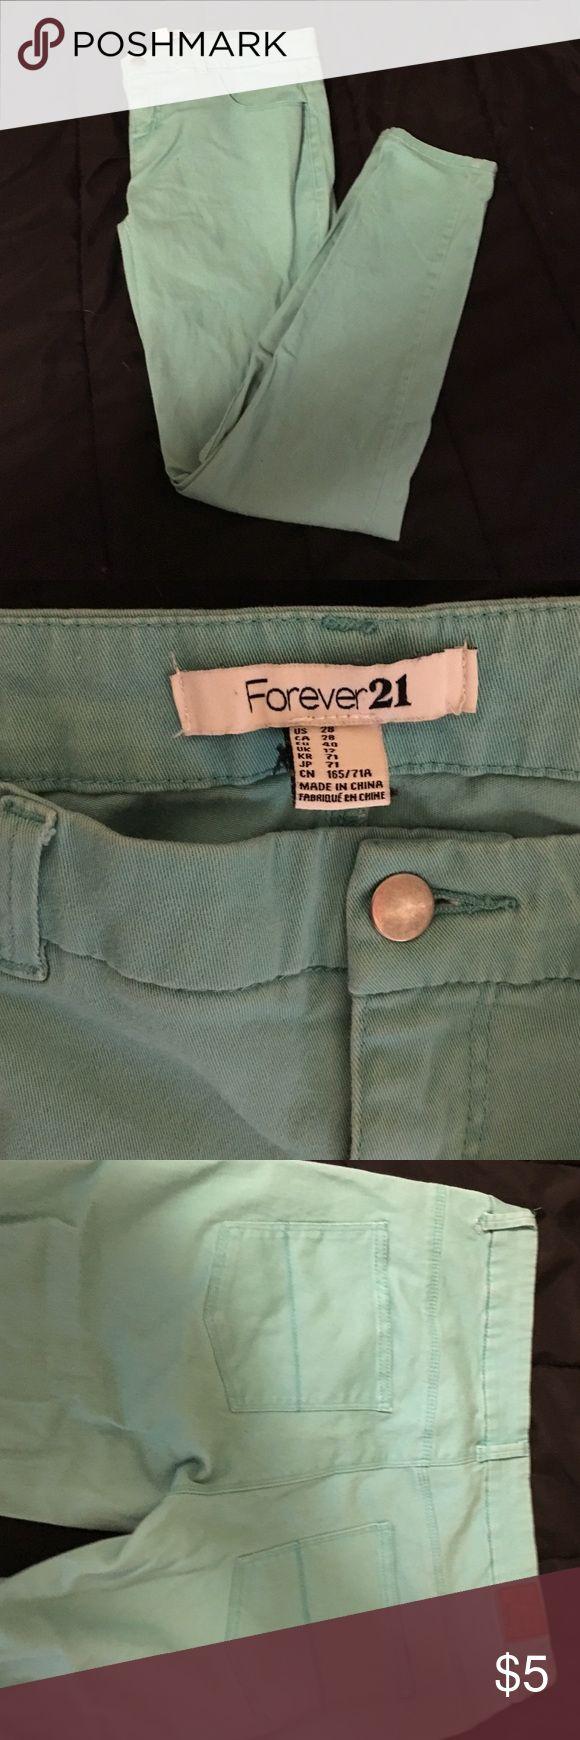 Selling this Forever 21 Teal Skinny Jeans on Poshmark! My username is: shopkelsandnina. #shopmycloset #poshmark #fashion #shopping #style #forsale #Forever 21 #Denim